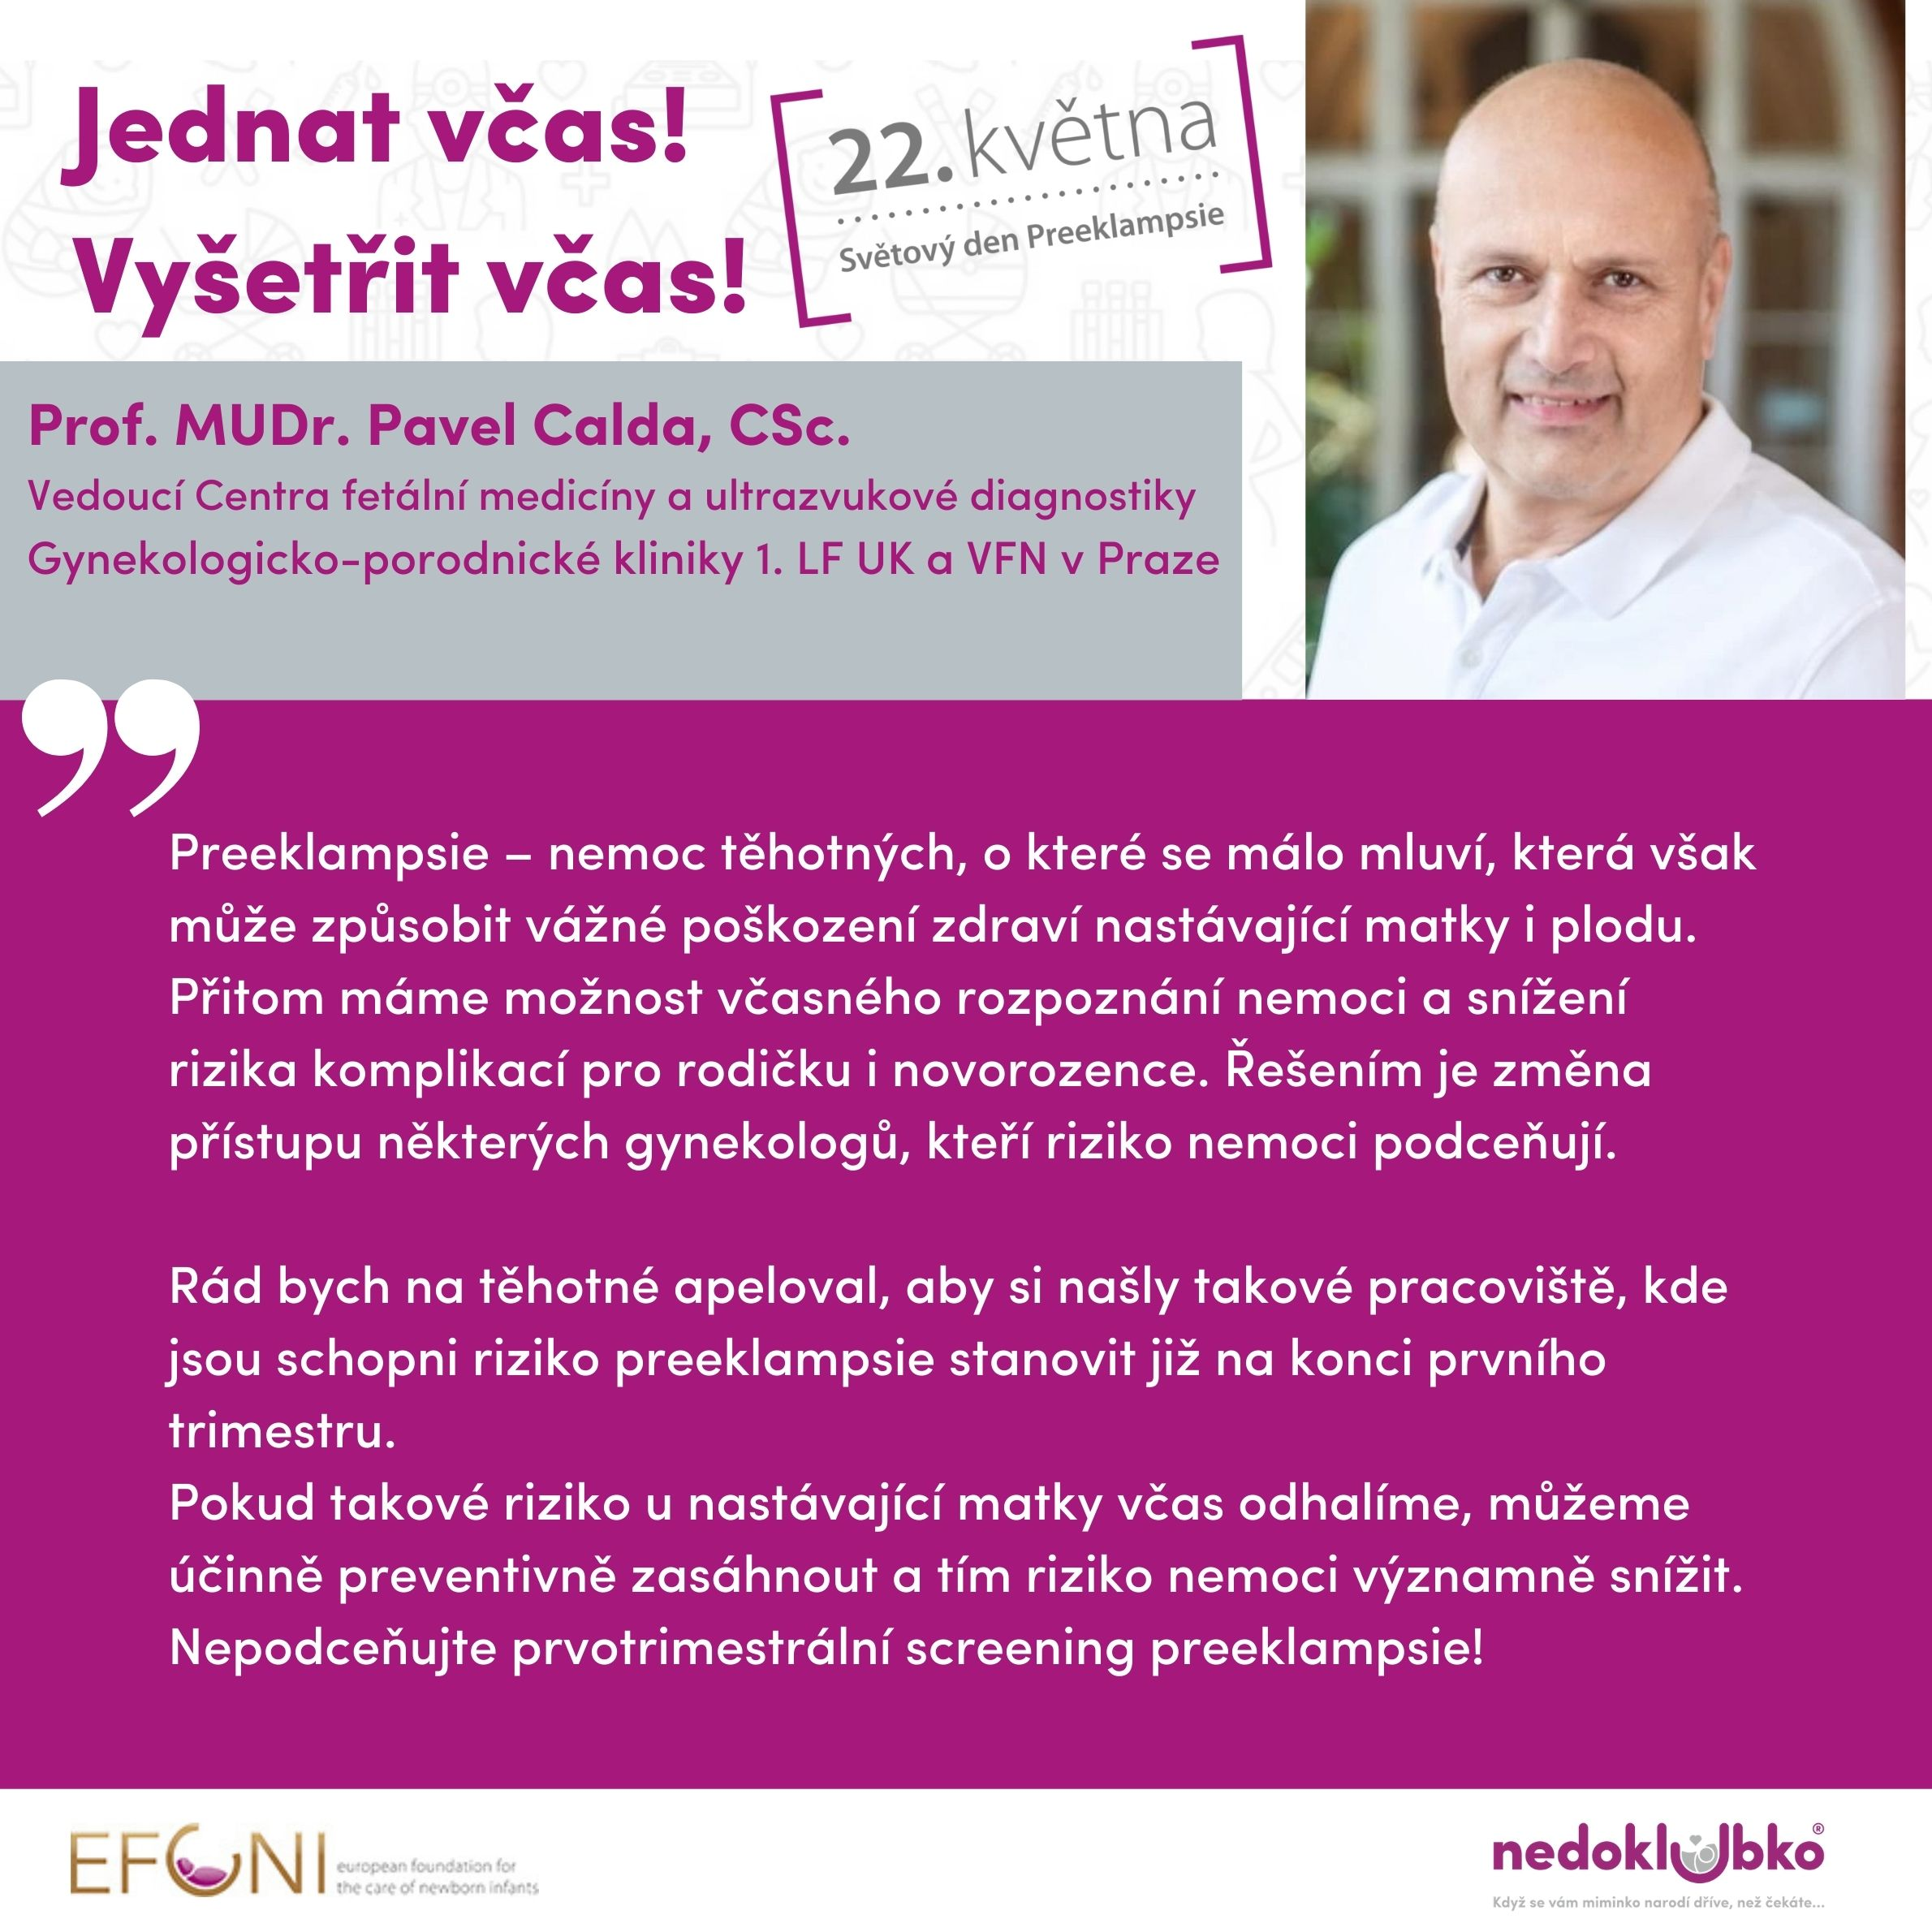 Preeklampsie Nedoklubko 2021 prof Calda5